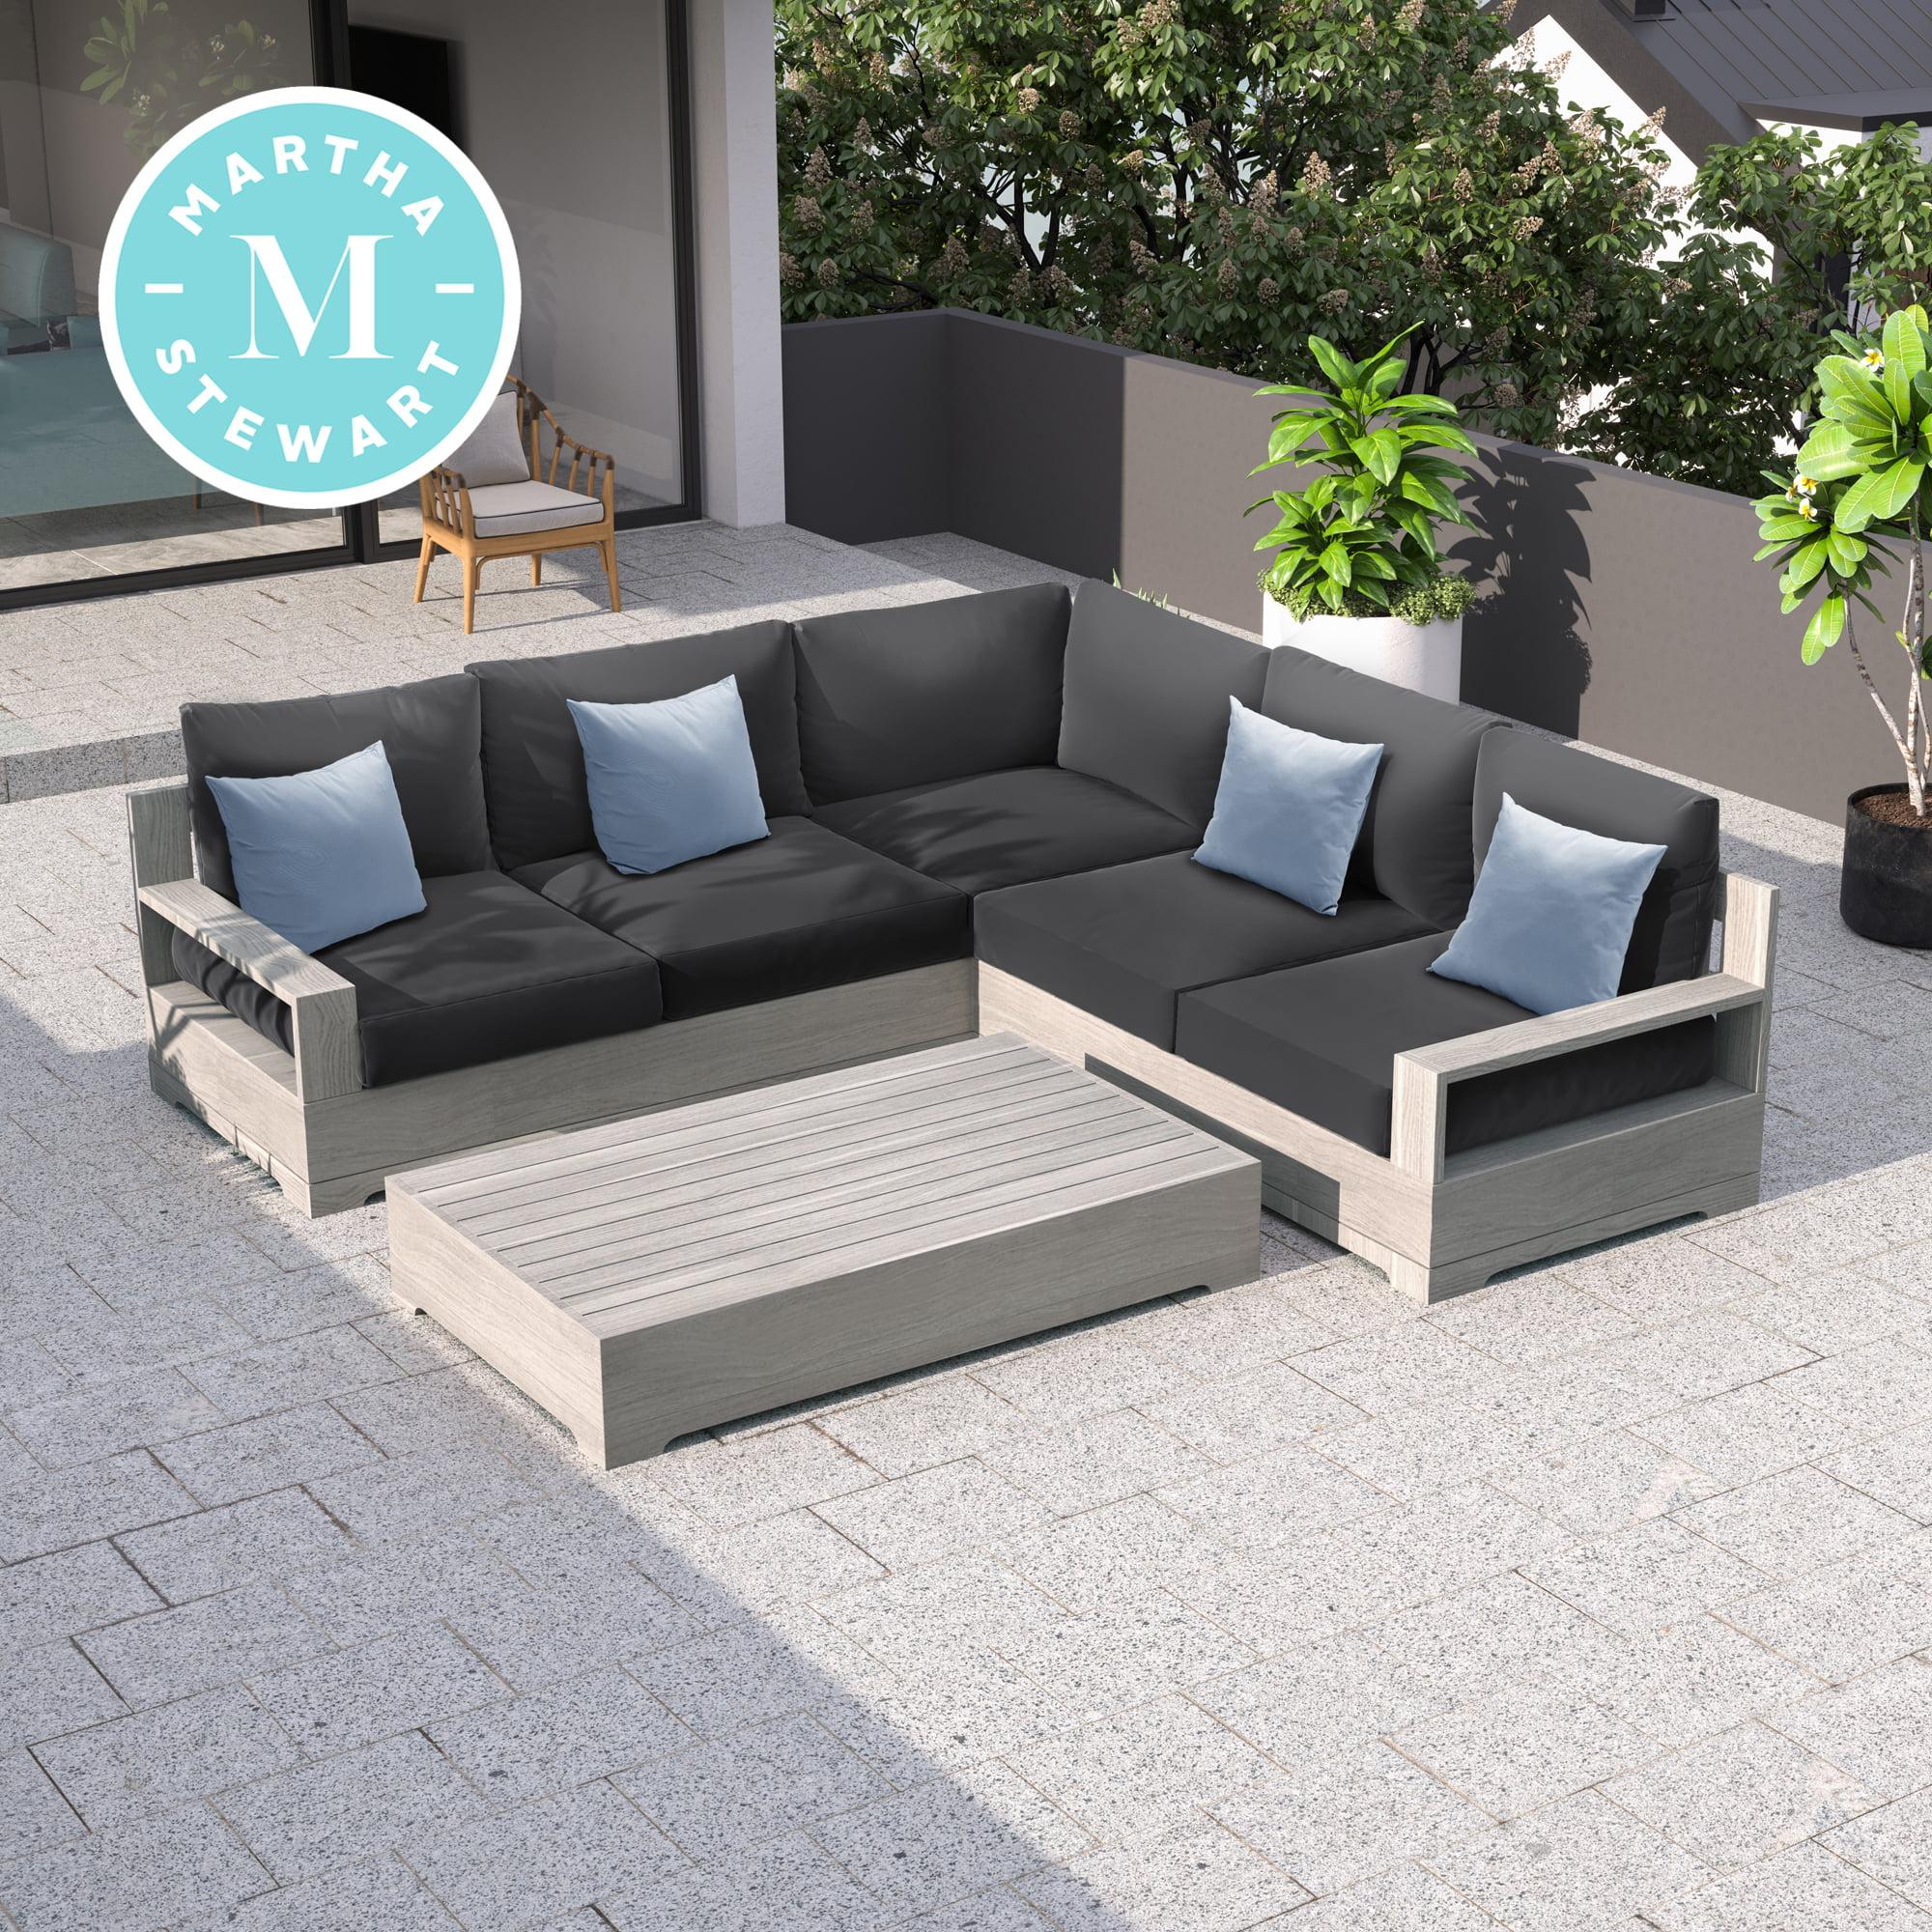 martha stewart hillcrest 3 piece wood frame grey patio sectional set walmart com